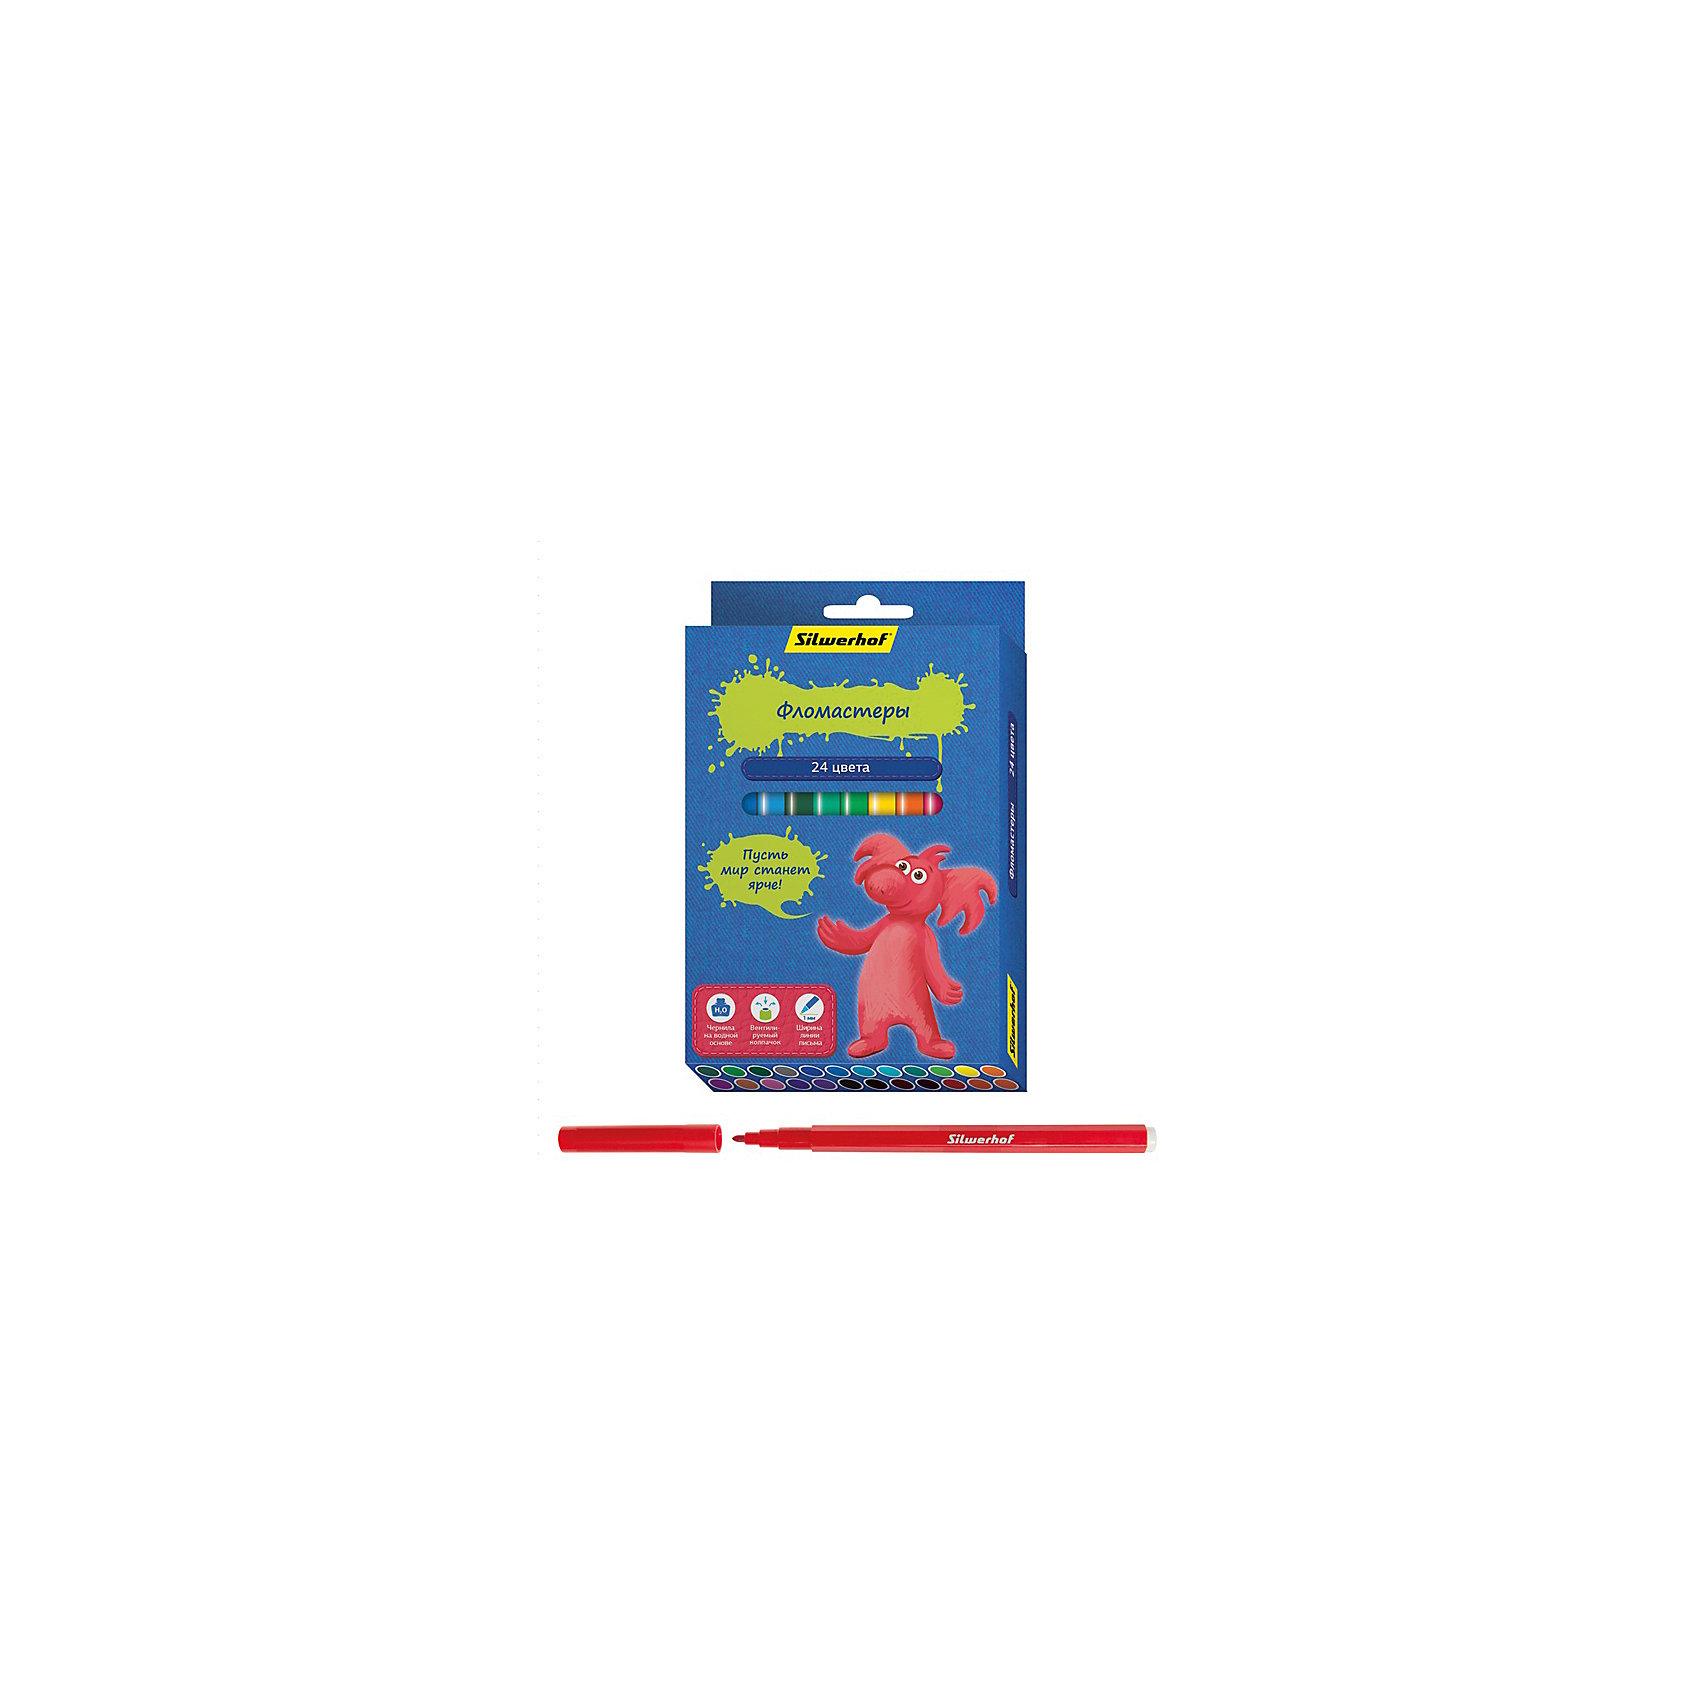 Silwerhof Фломастеры, 24цв, ДЖИНСОВАЯ КОЛЛЕКЦИЯ масляная пастель silwerhof 886002 06 джинсовая коллекция шестигранные 6цв дл 75ммд 11мм картон кор